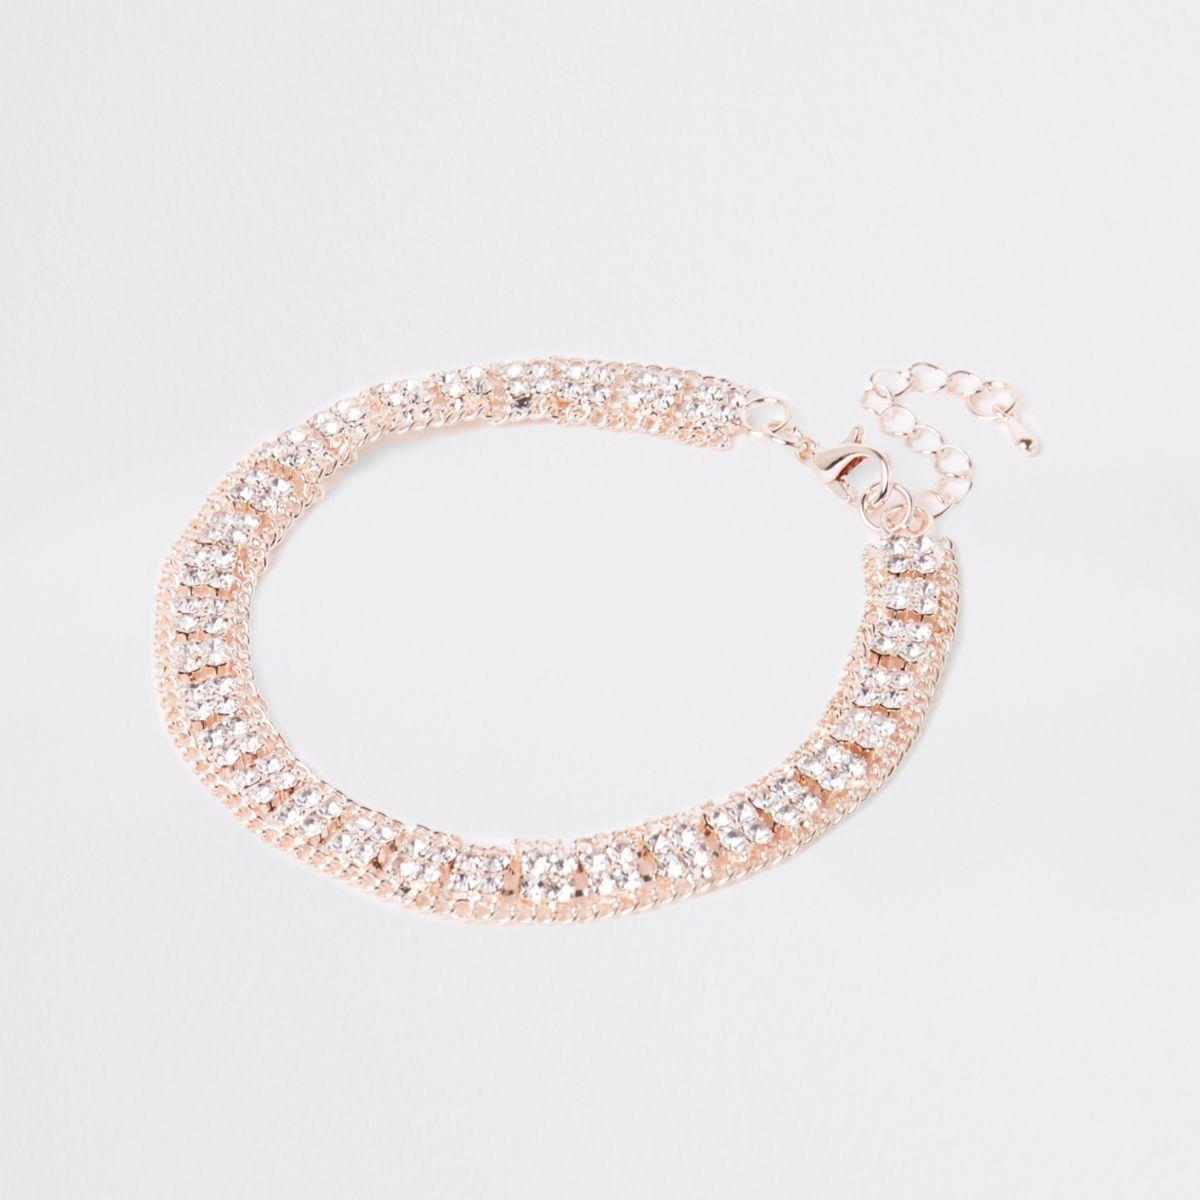 Rose gold tone square diamante pave anklet